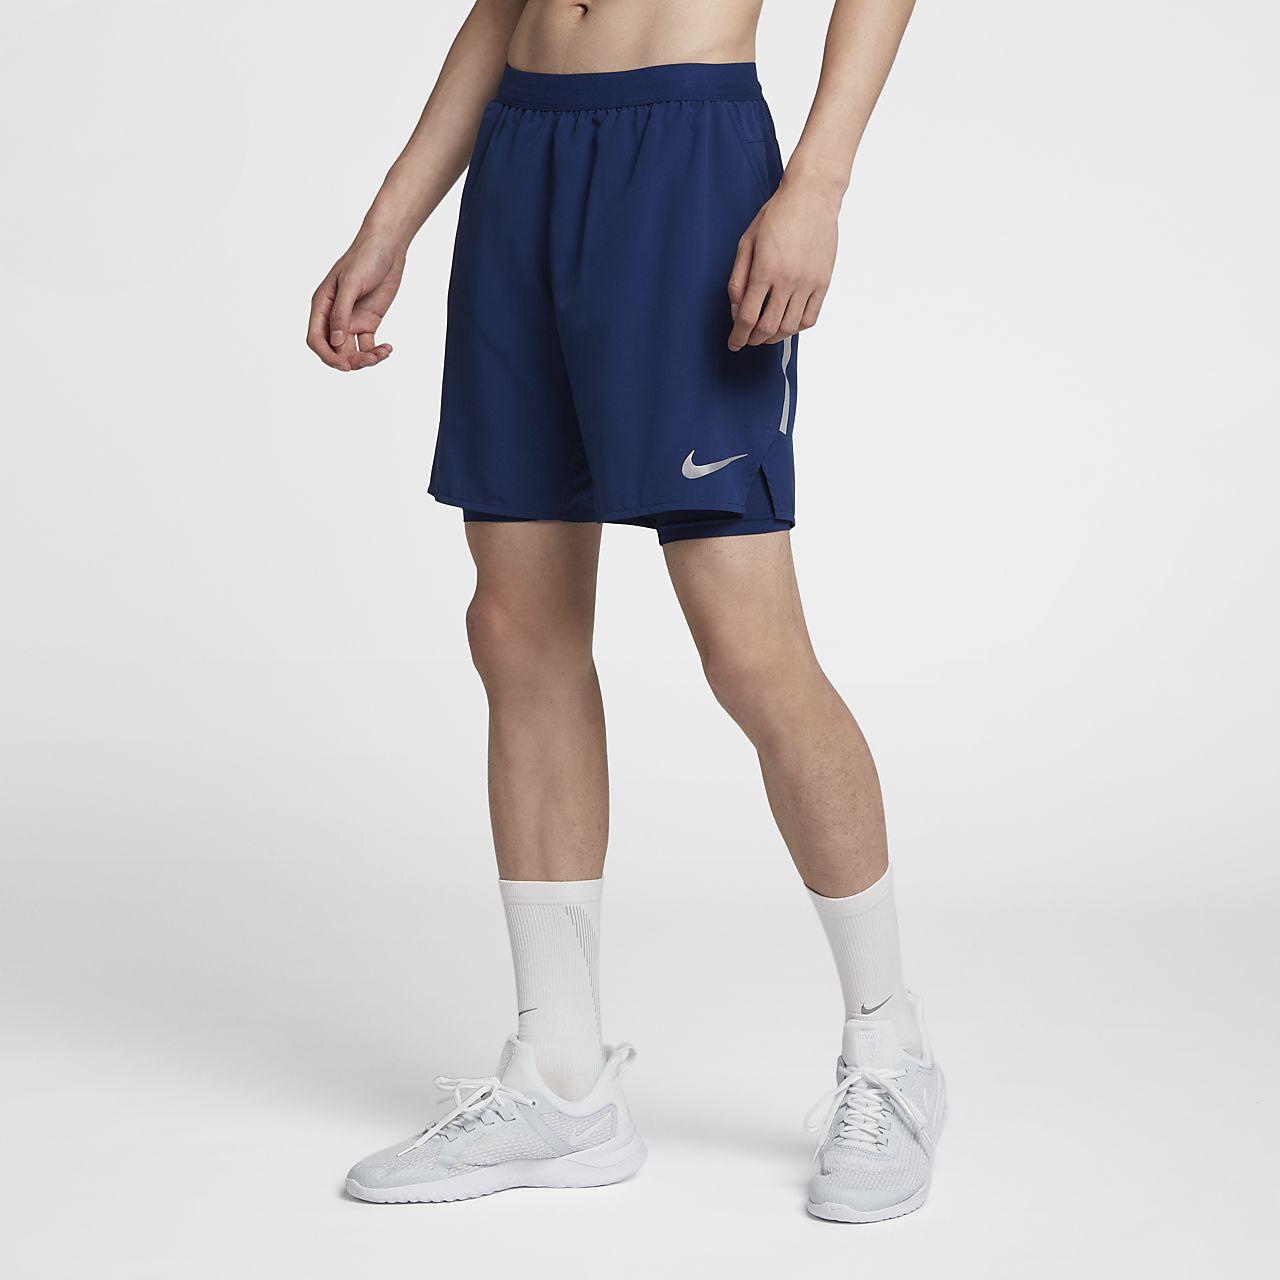 "Nike Distance 2-in-1 男款 7"" 跑步短褲"